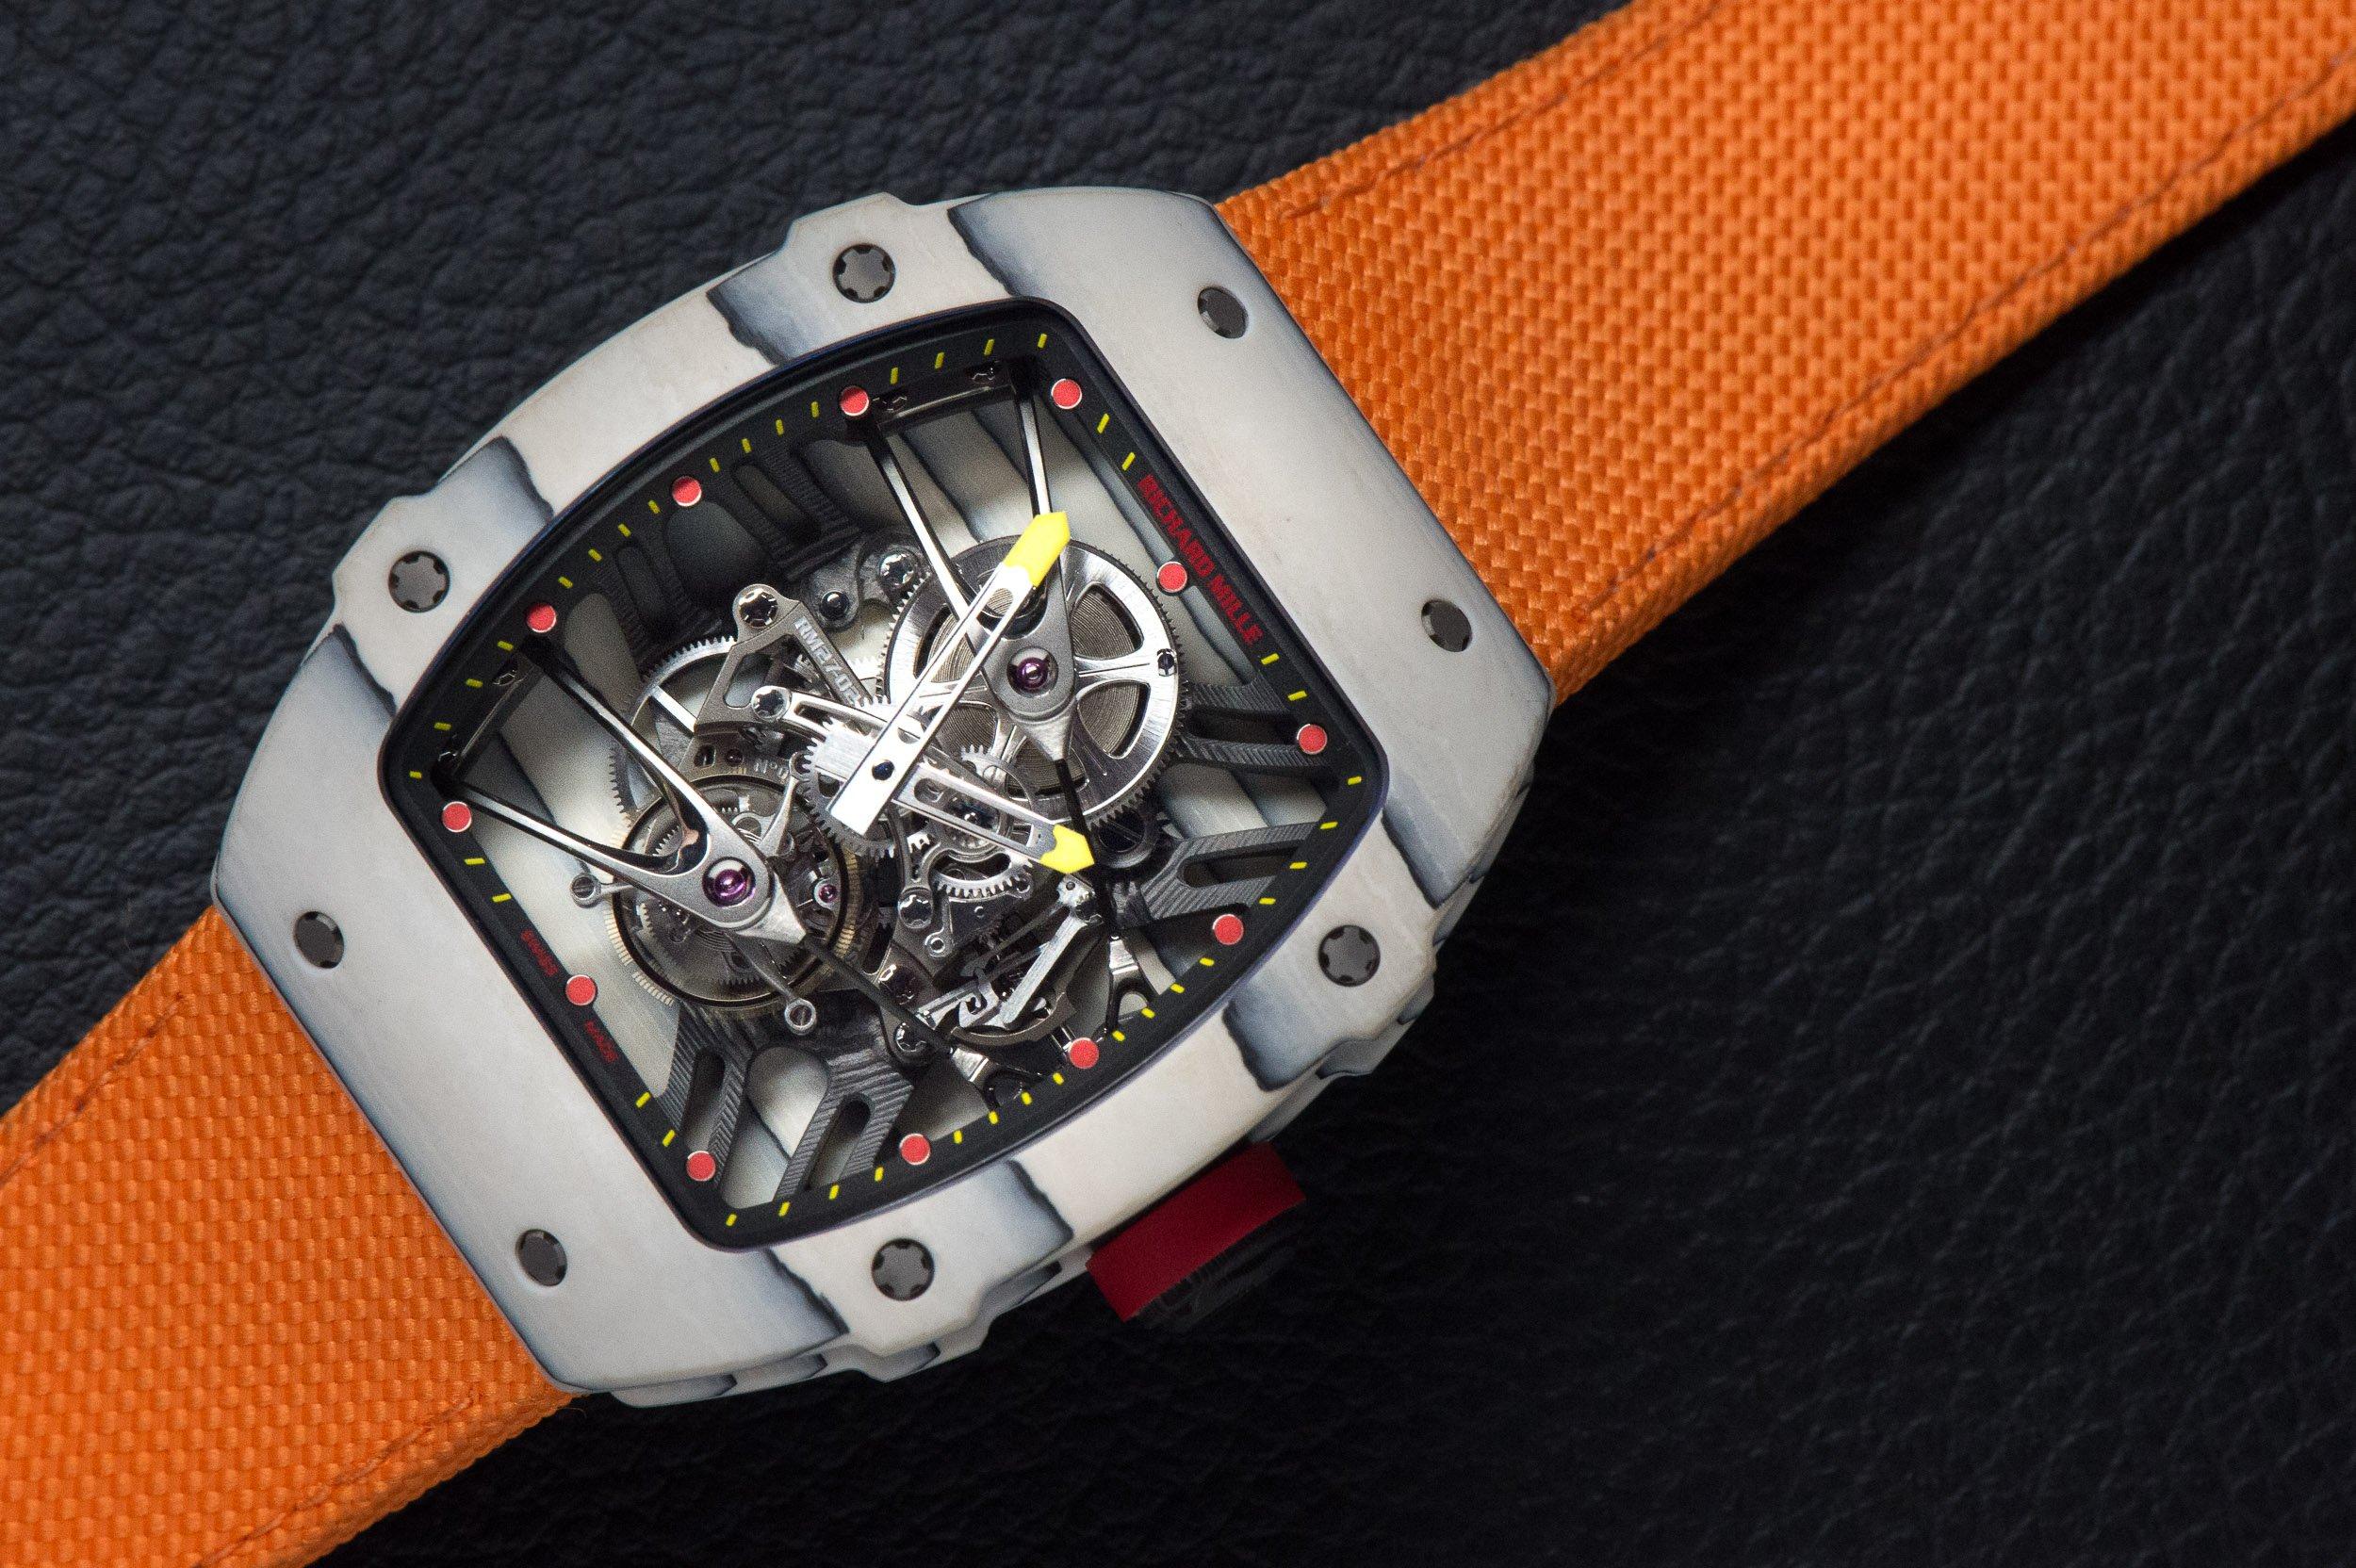 Richard-Mille-RM-27-02-Rafael-Nadal-Wrist-